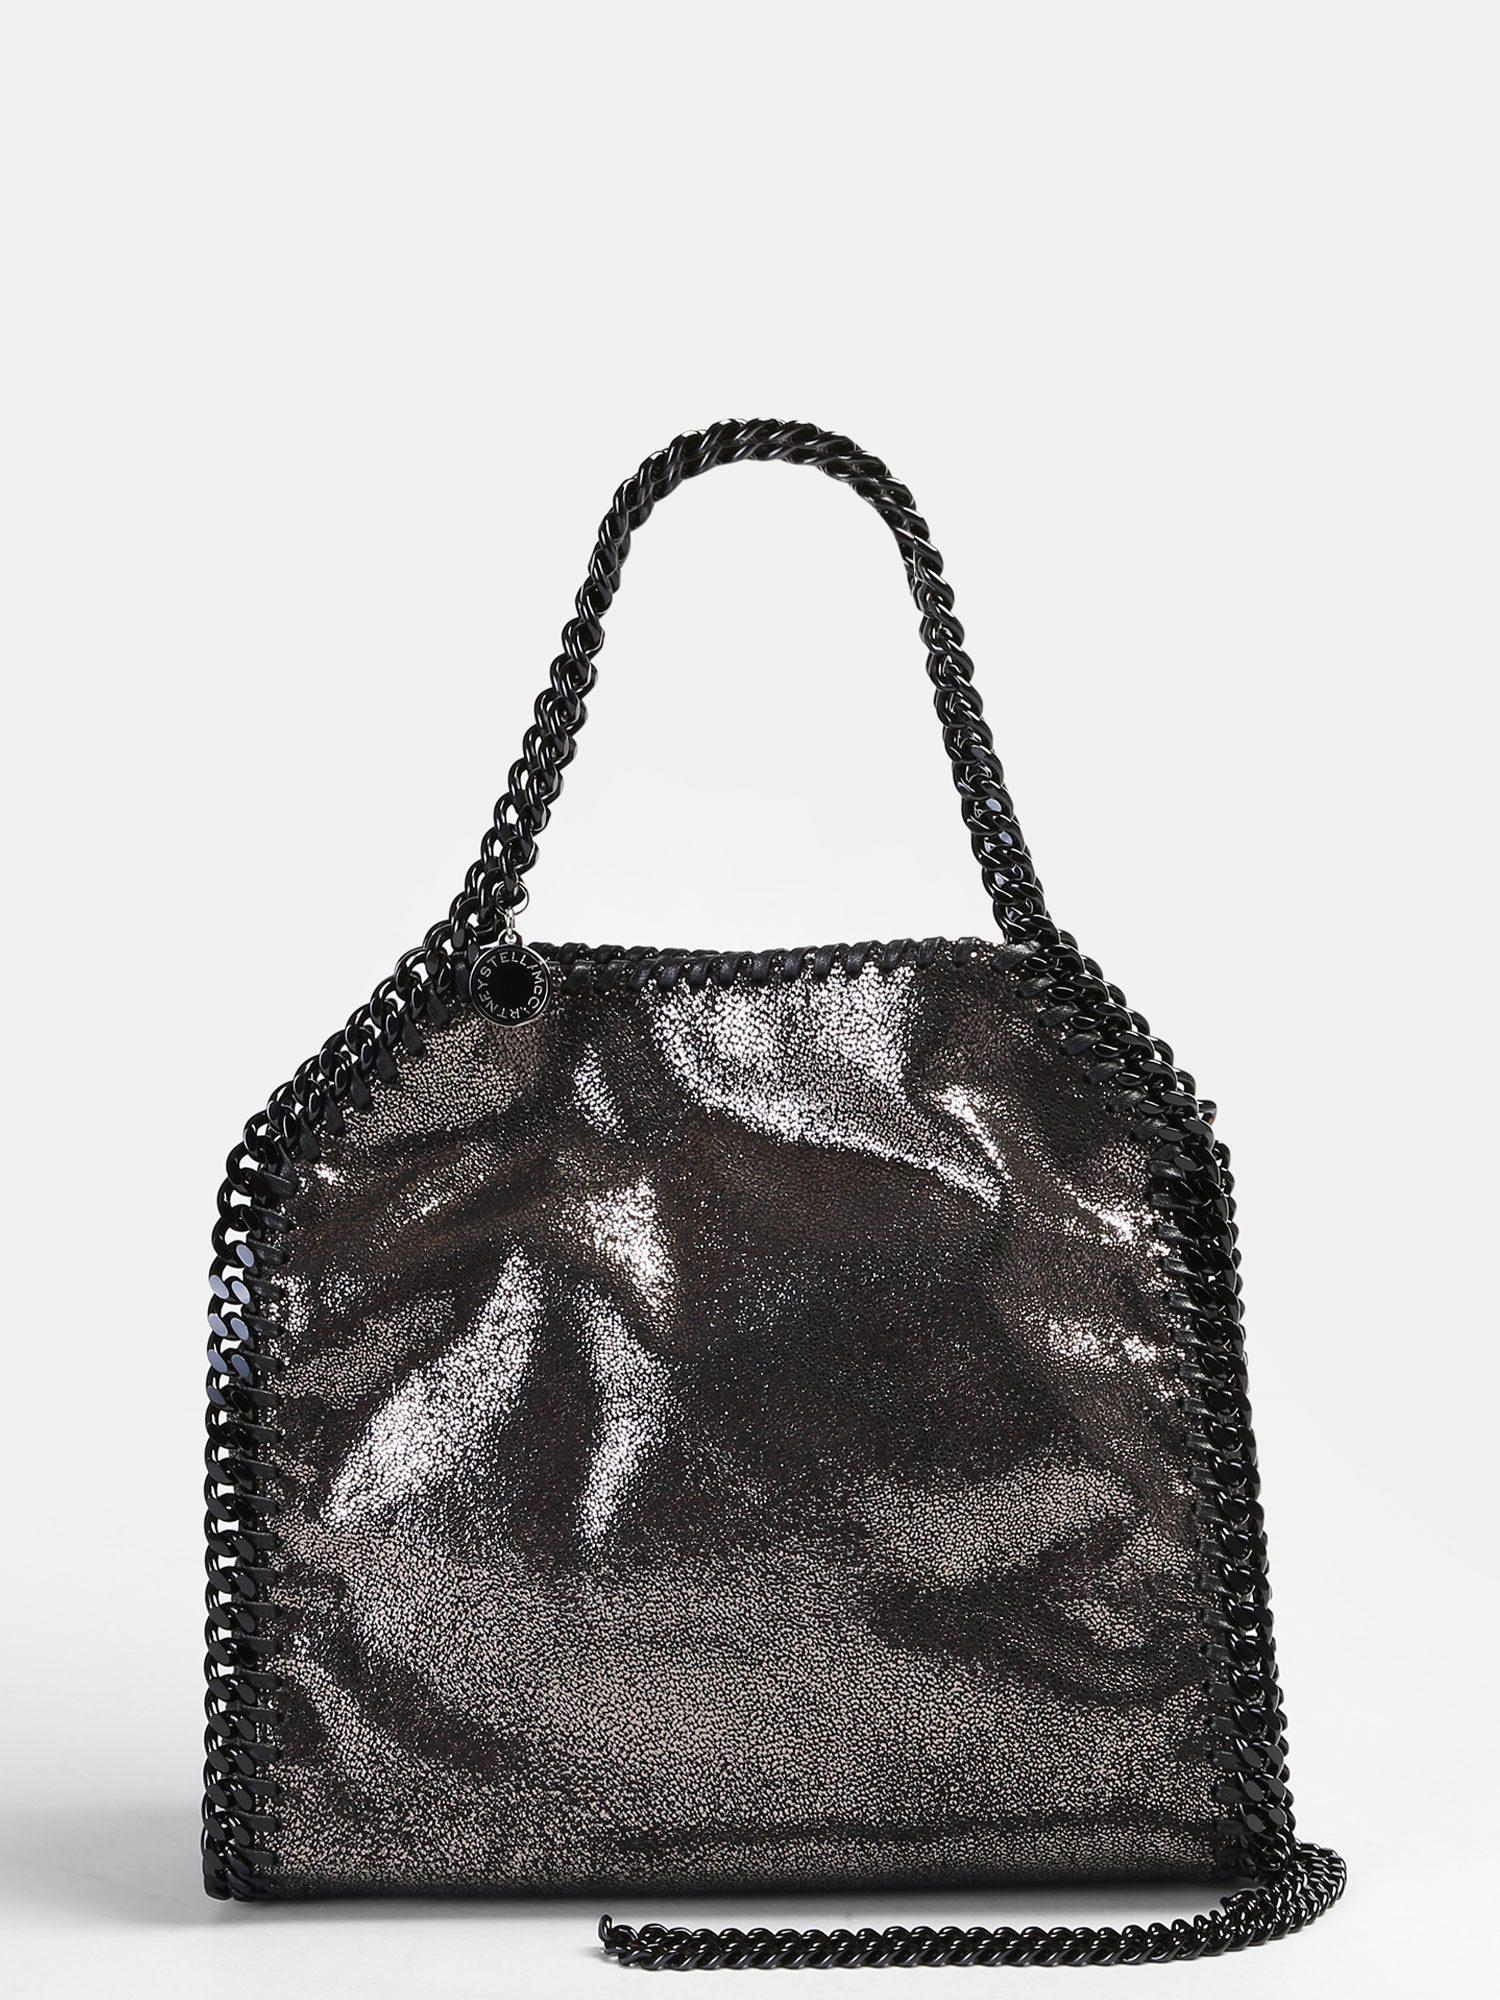 acb03c6aaafa Lyst - Stella Mccartney Mini Falabella Faux Leather Bag in Black